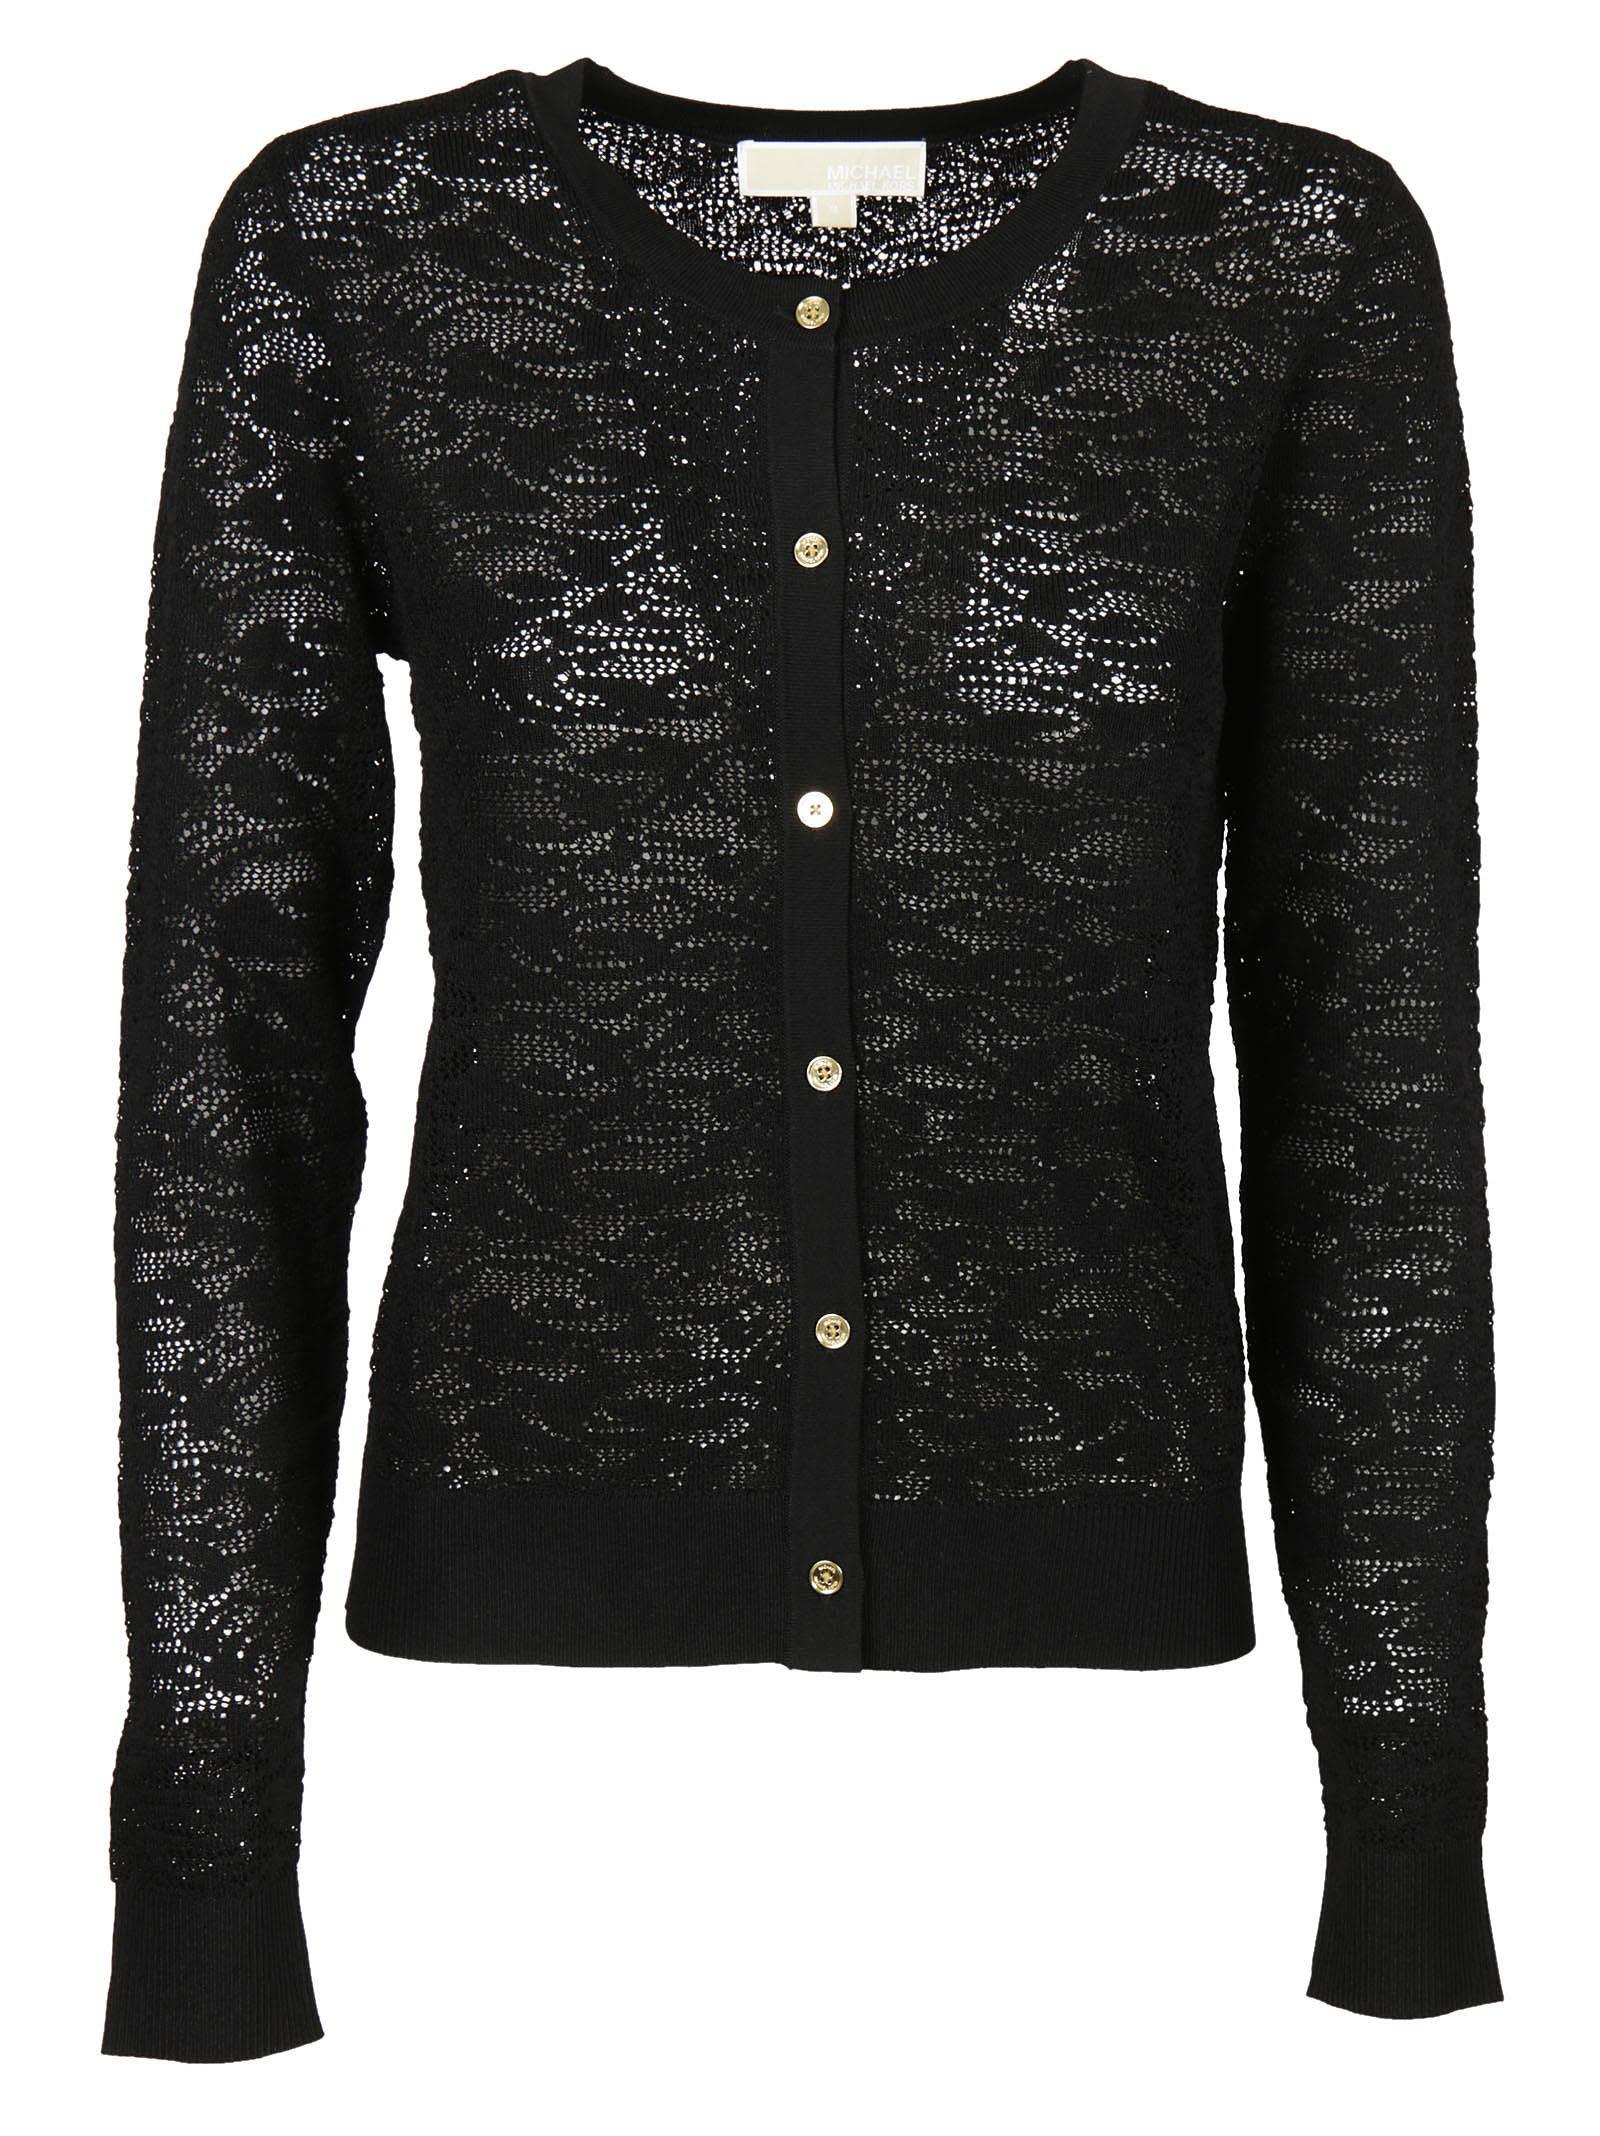 Michael Kors - Michael Michael Kors Lace Cardigan - Black, Women's ...